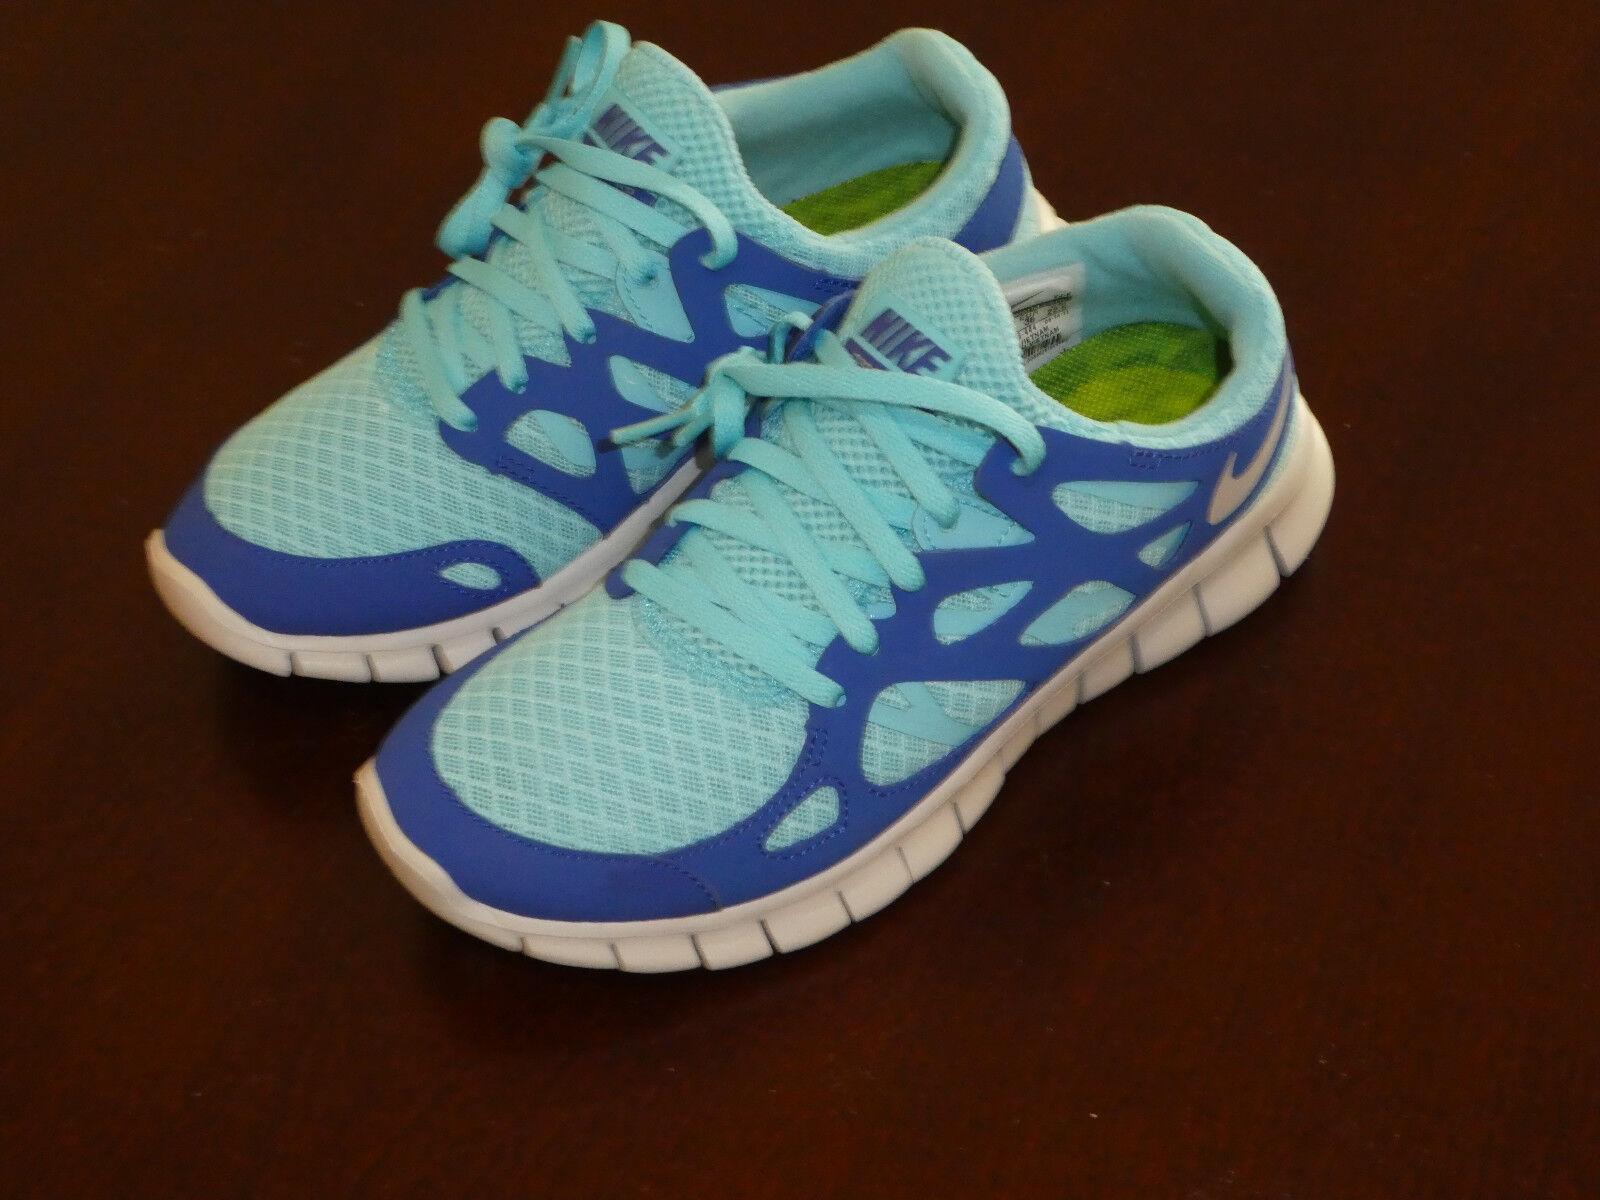 Nike womens Free Run 2 shoes sneakers new 443816 444 blue